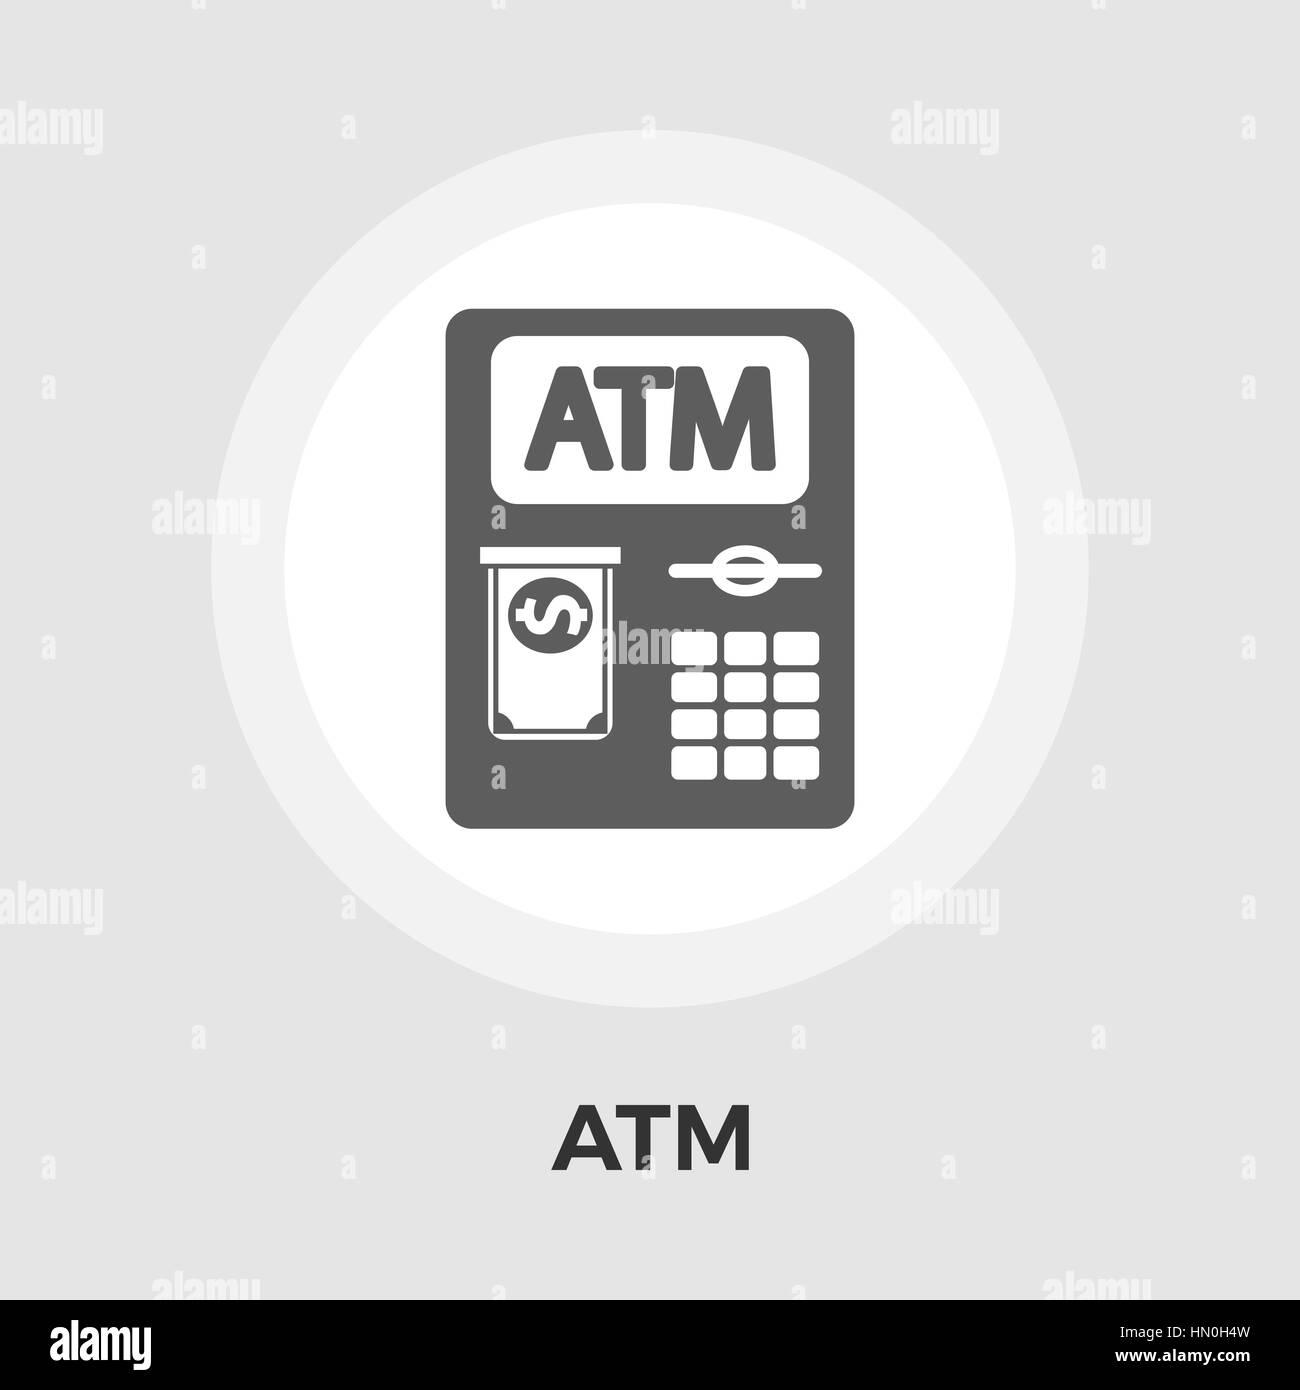 Aalam payday loans image 9